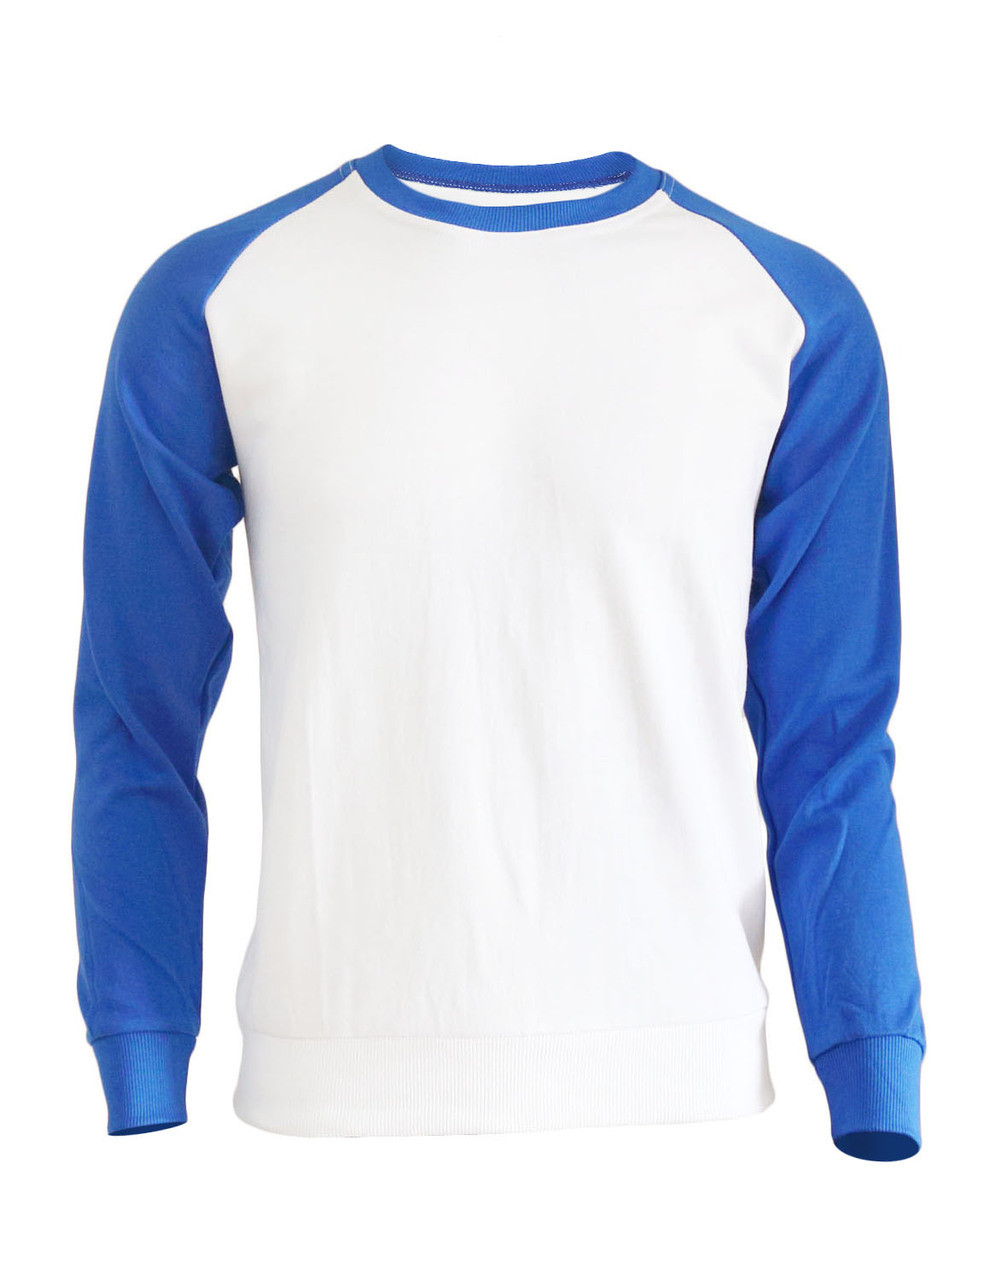 b814bcede4dca1 BCPOLO Men s Casual raglan 2 tone color t-shirt sportswear fashion ...